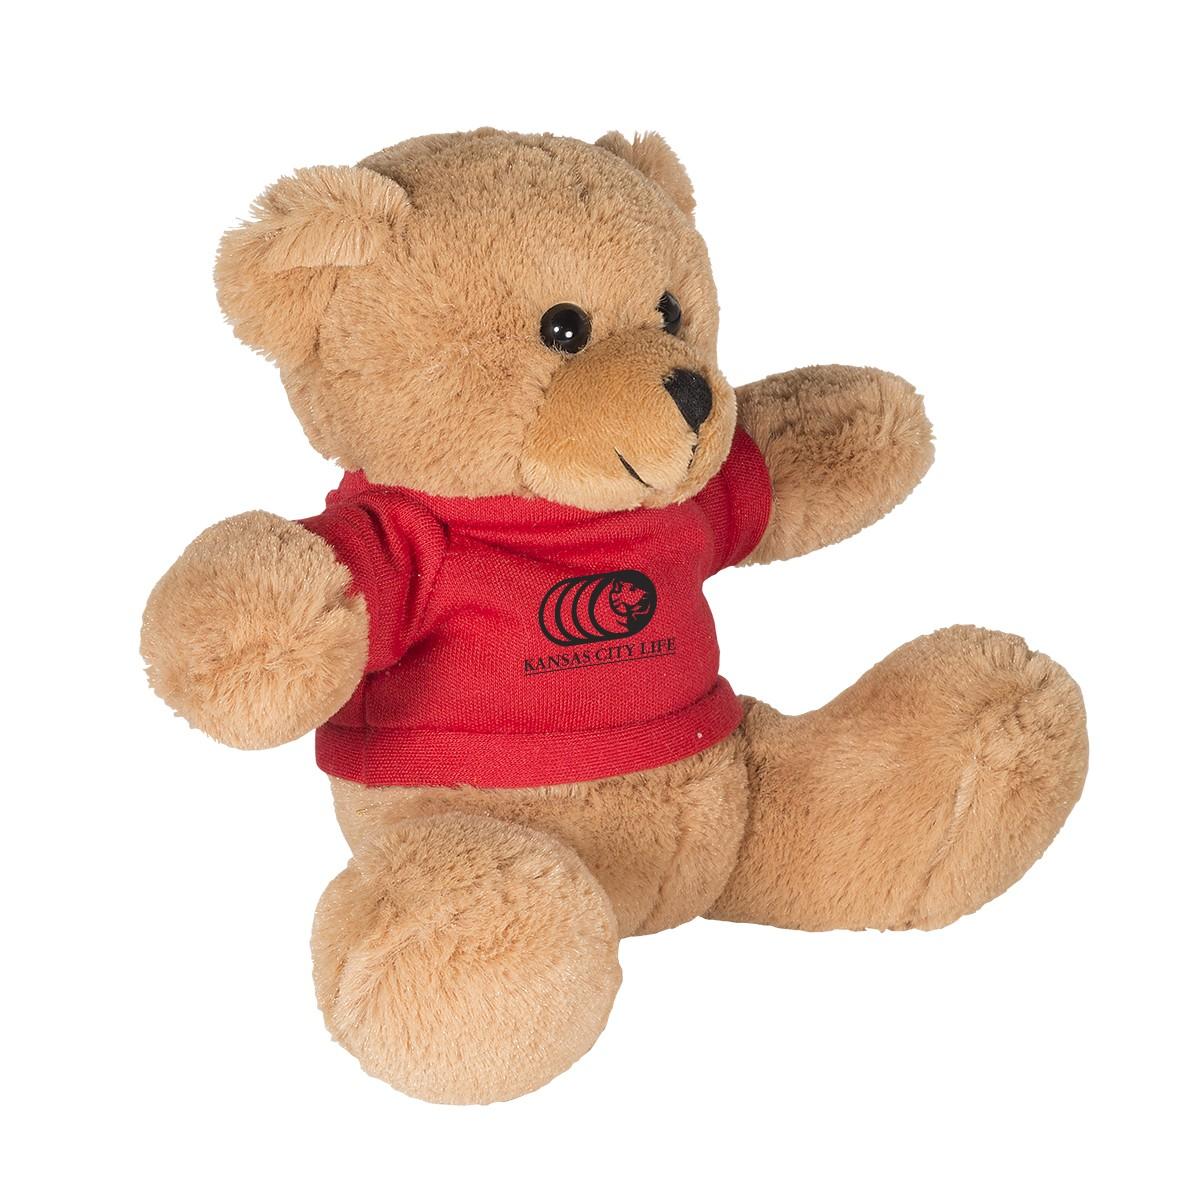 "7"" Plush Bear with T-Shirt"